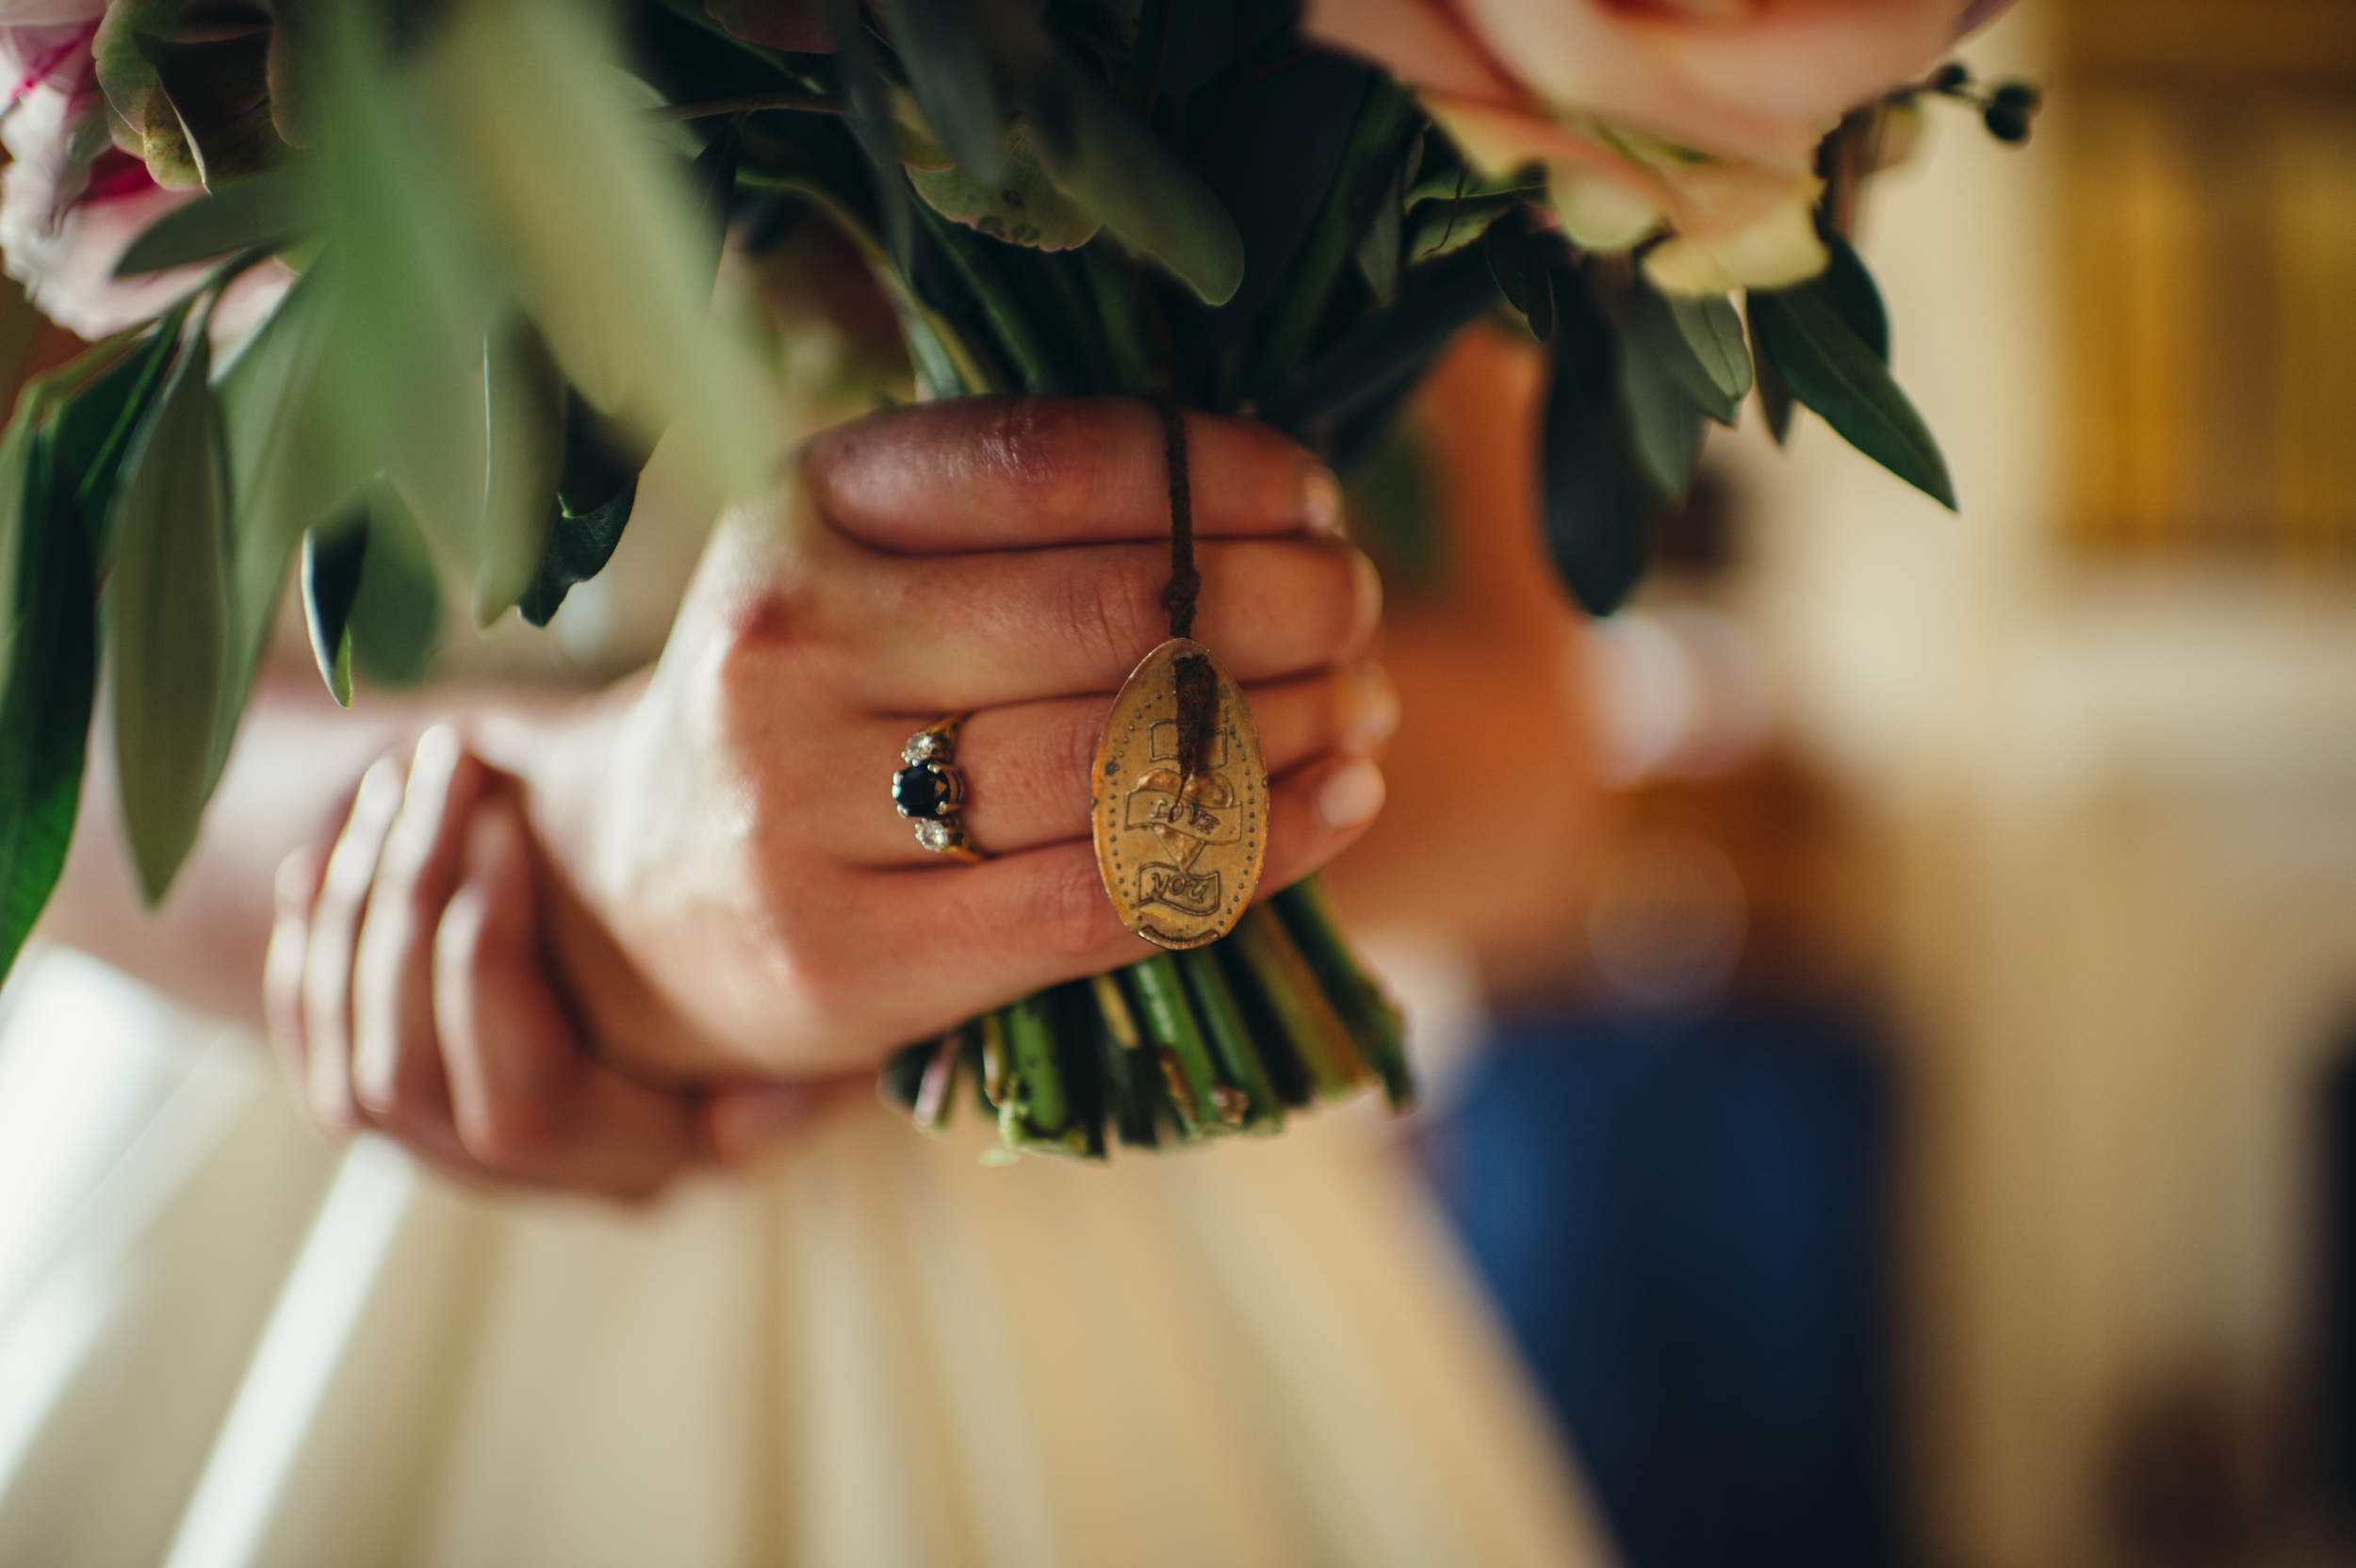 0082-lisa-devine-alternative-creative-wedding-photography-glasgow-edinburgh.JPG